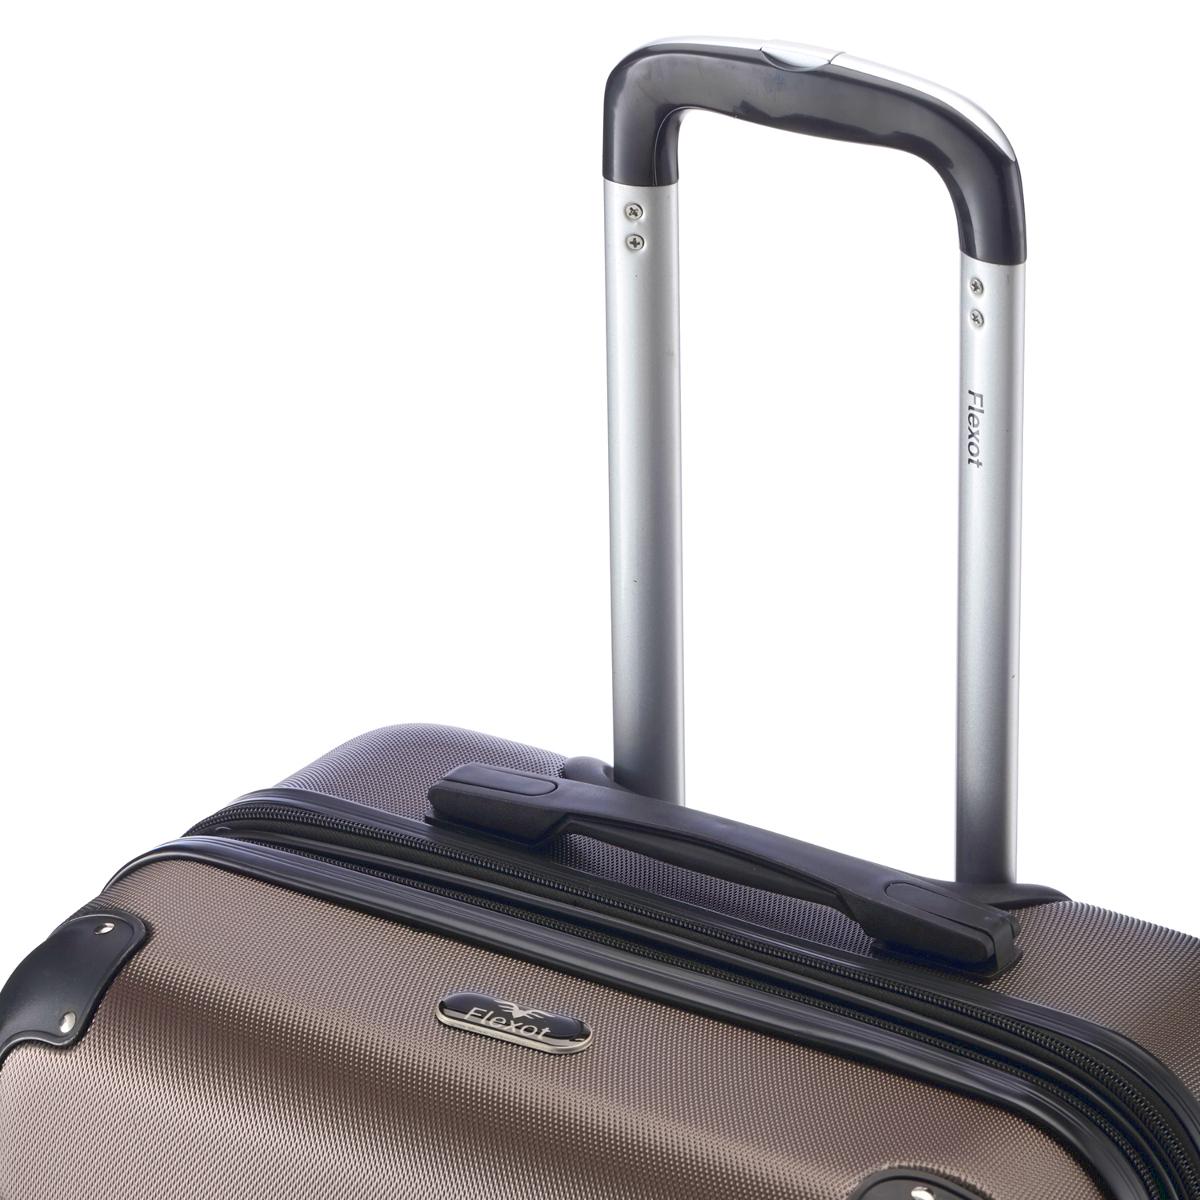 Koffer-Flexot-2045-Hartschalenkoffer-Trolley-Kofferset-Reisekoffer-M-L-XL-Set Indexbild 66